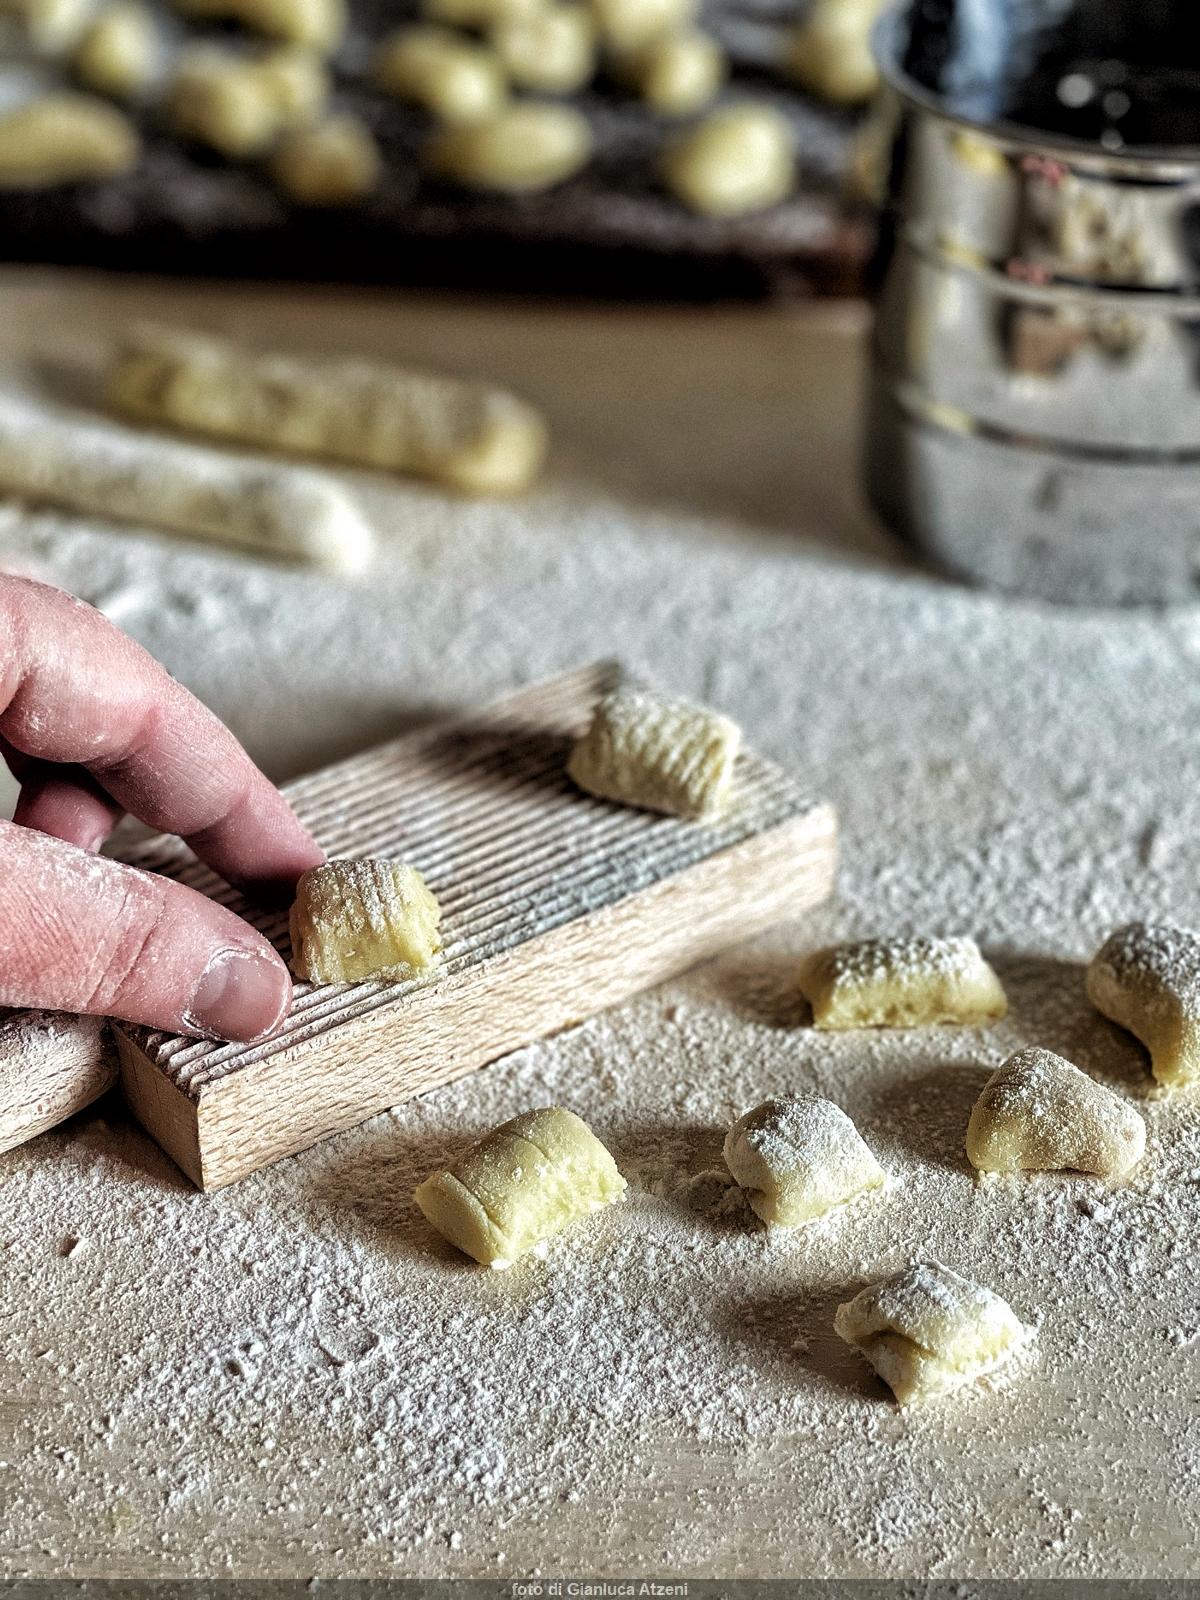 Ricetta Gnocchi Di Patate Viola Senza Uova.Gli Gnocchi Di Patate Siciliani Creativi In Cucina